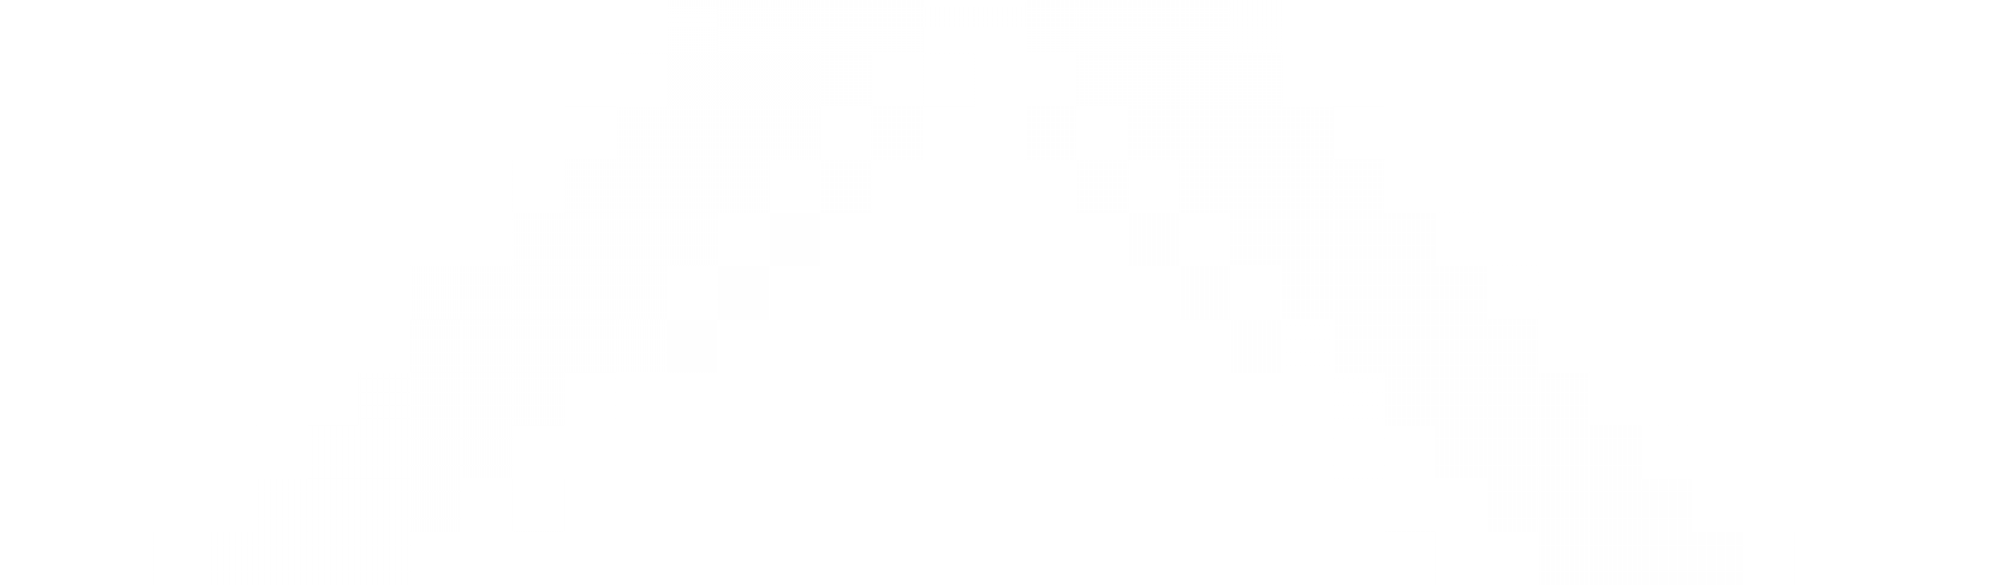 up-white